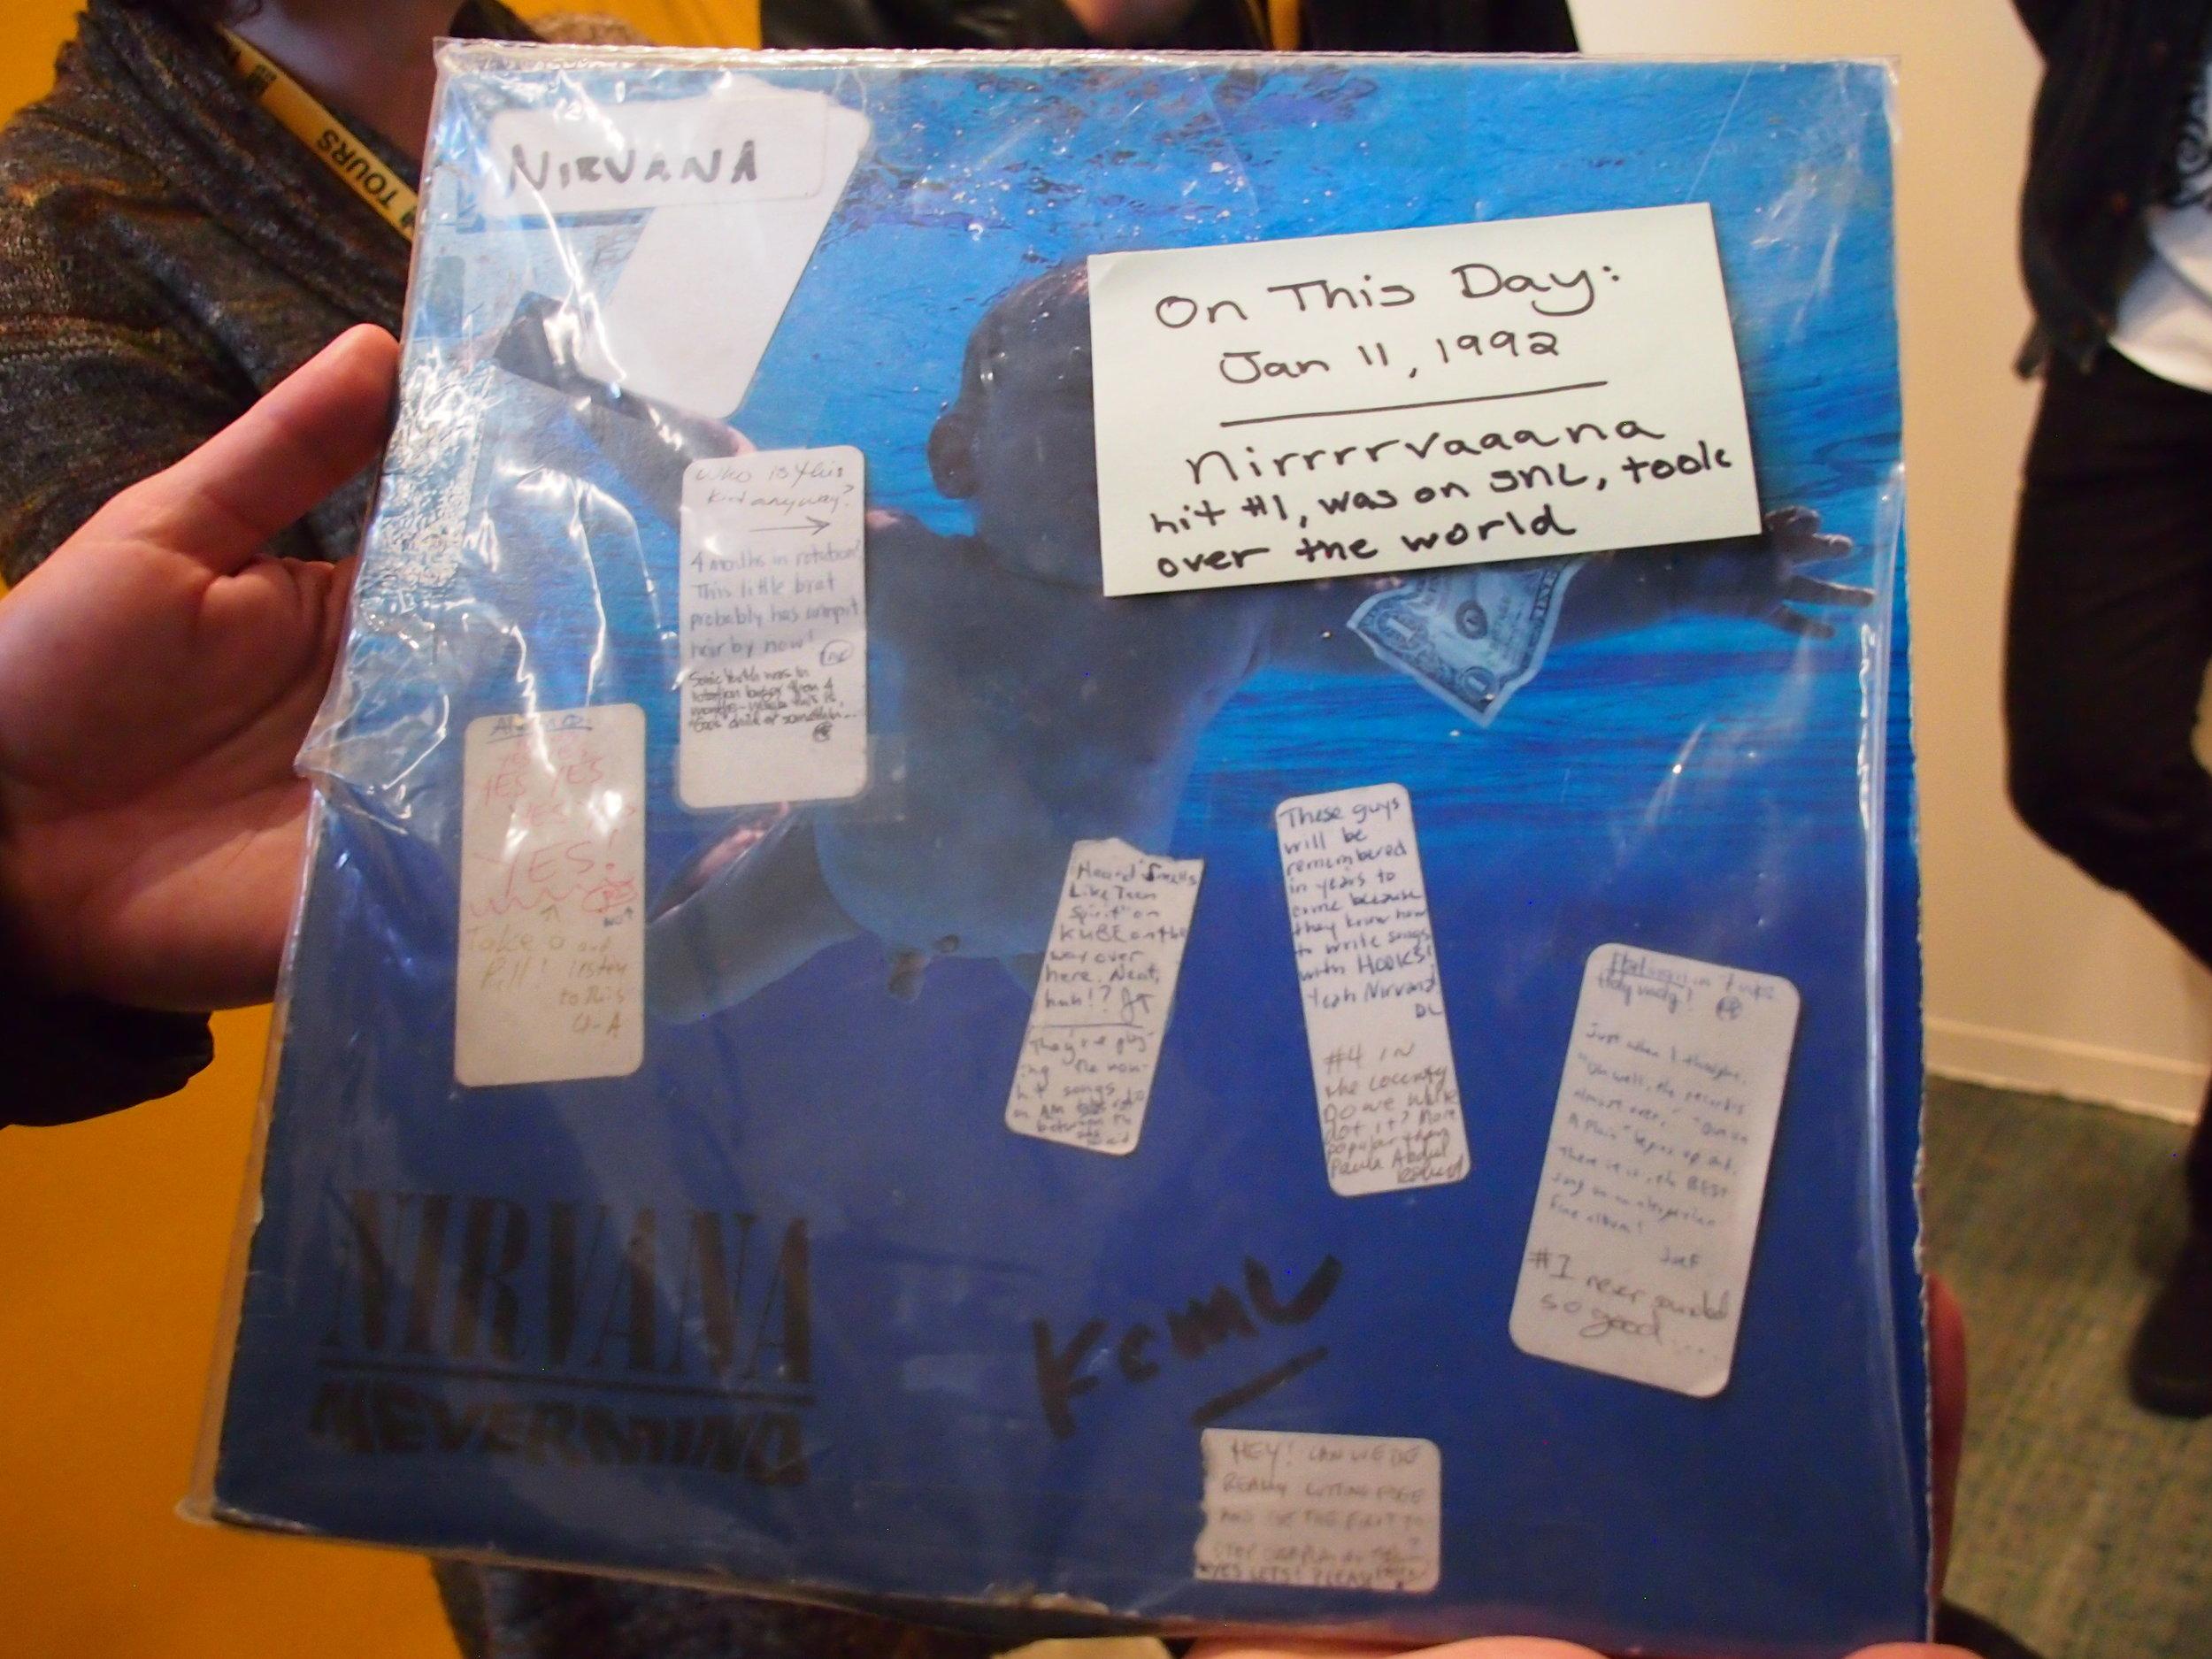 original Nirvanna vinyl and DJ notes